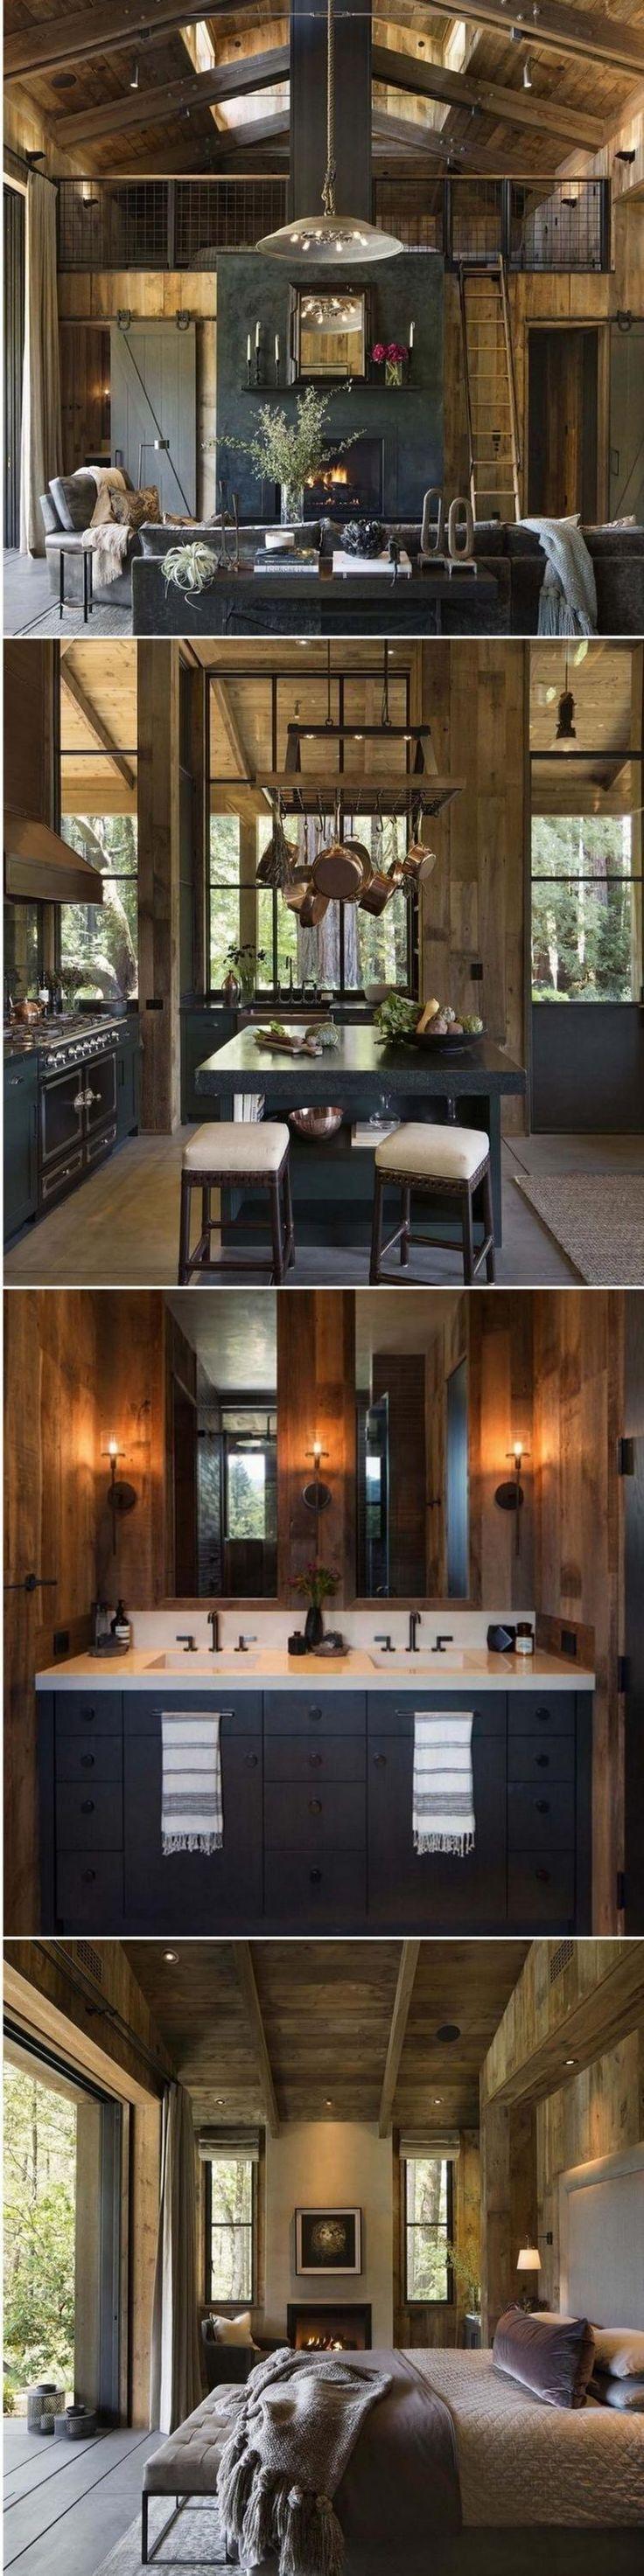 30+ Cool Cabin Style Design Ideas